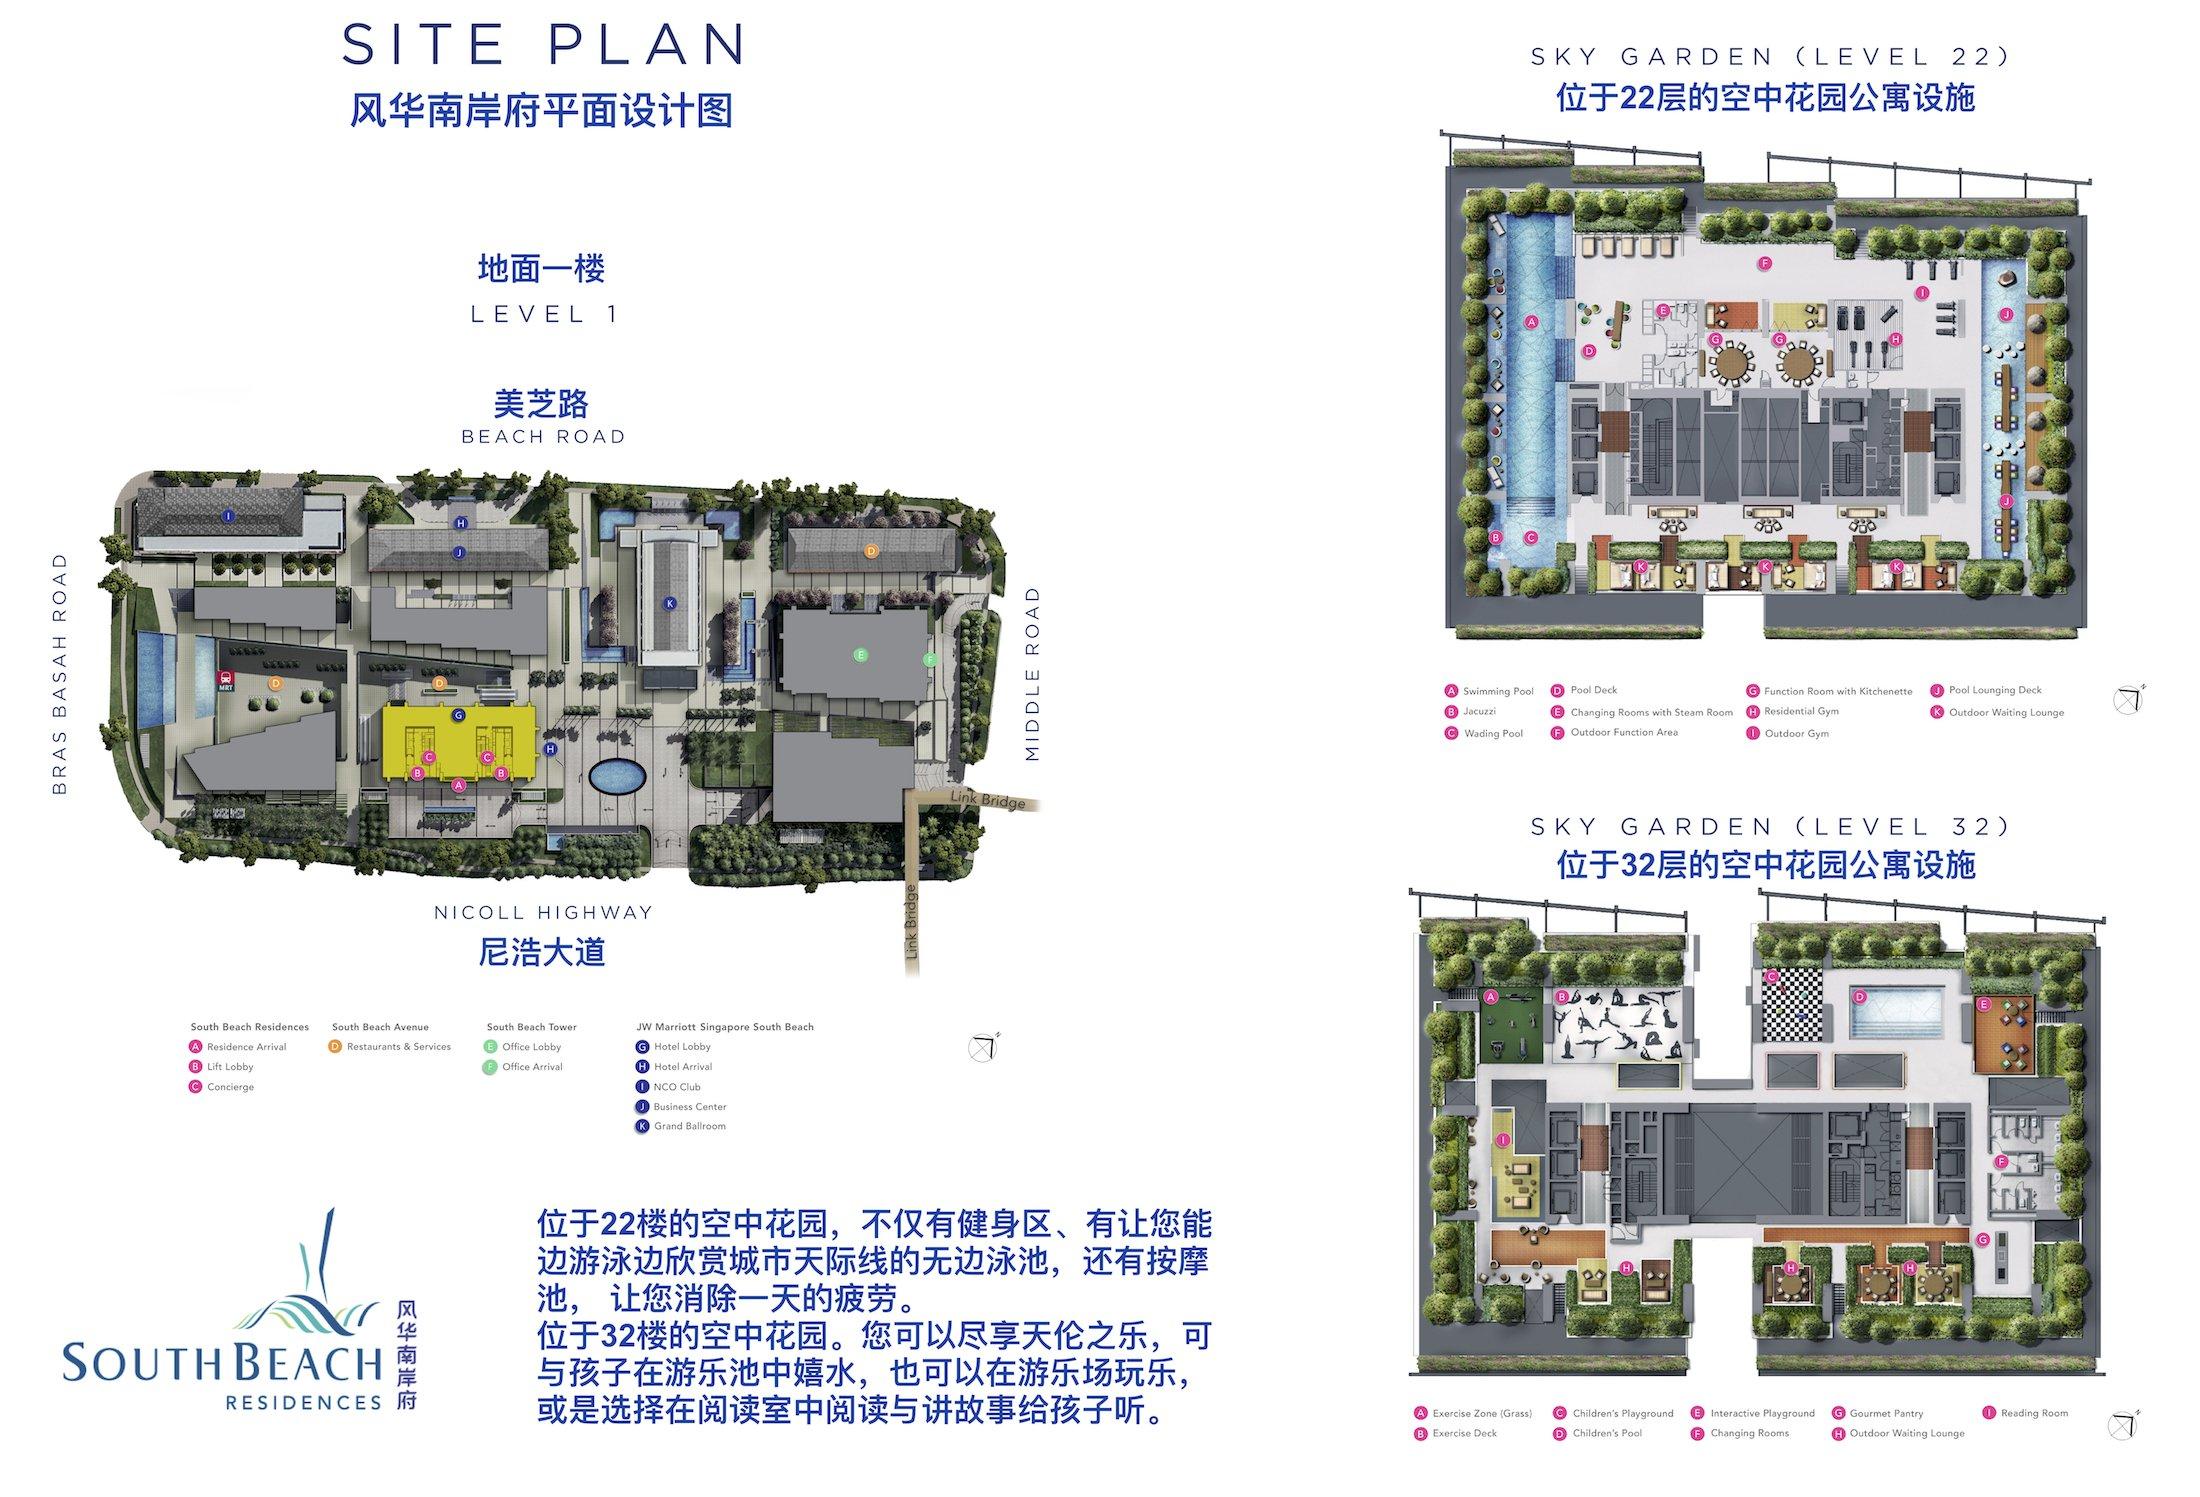 South Beach Residences-风华南岸府设计图公寓设施